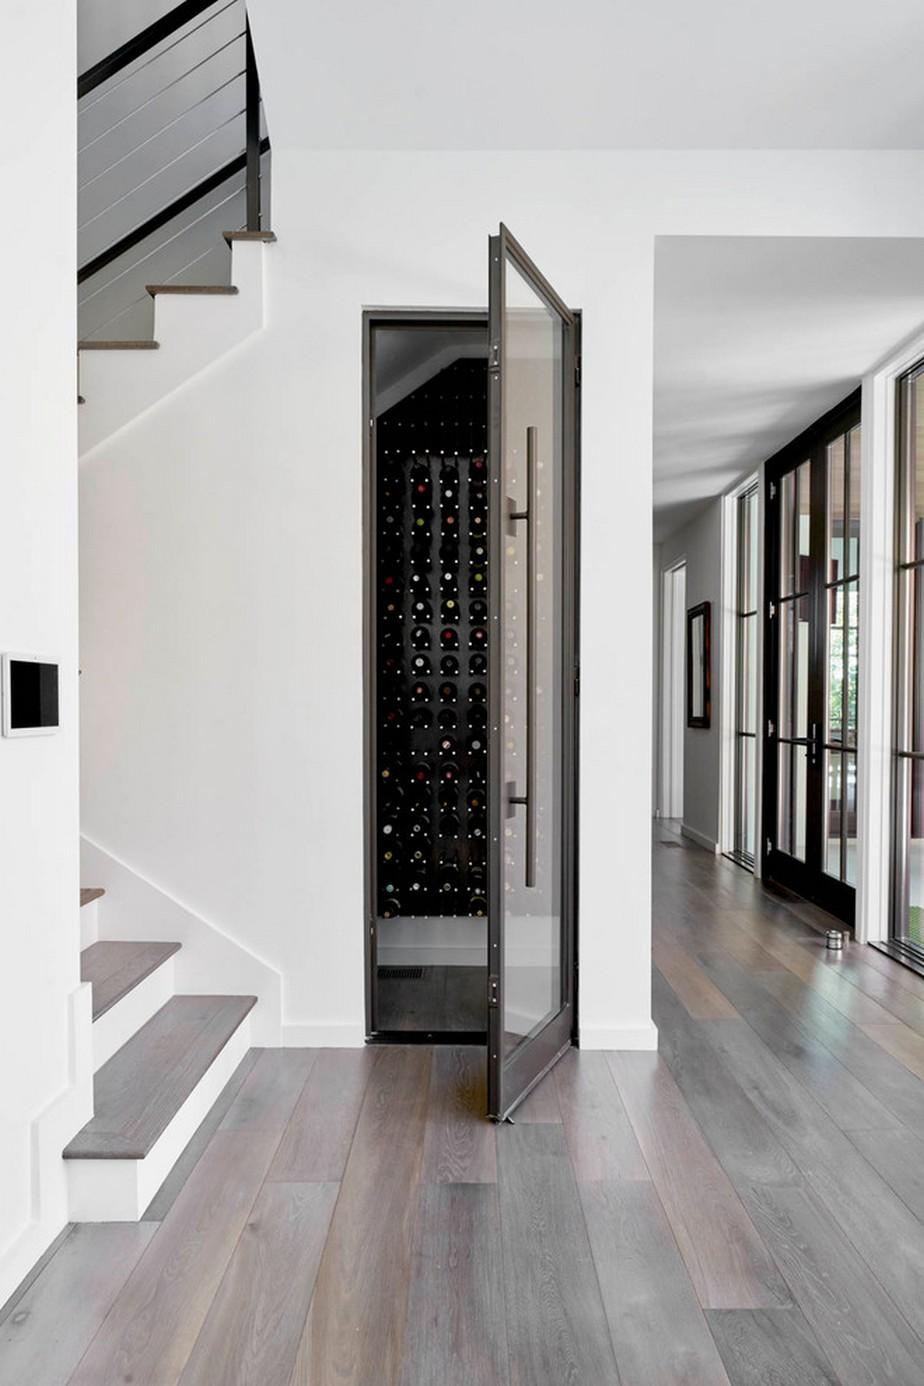 Groovy Idea of Cellar Decor Concept